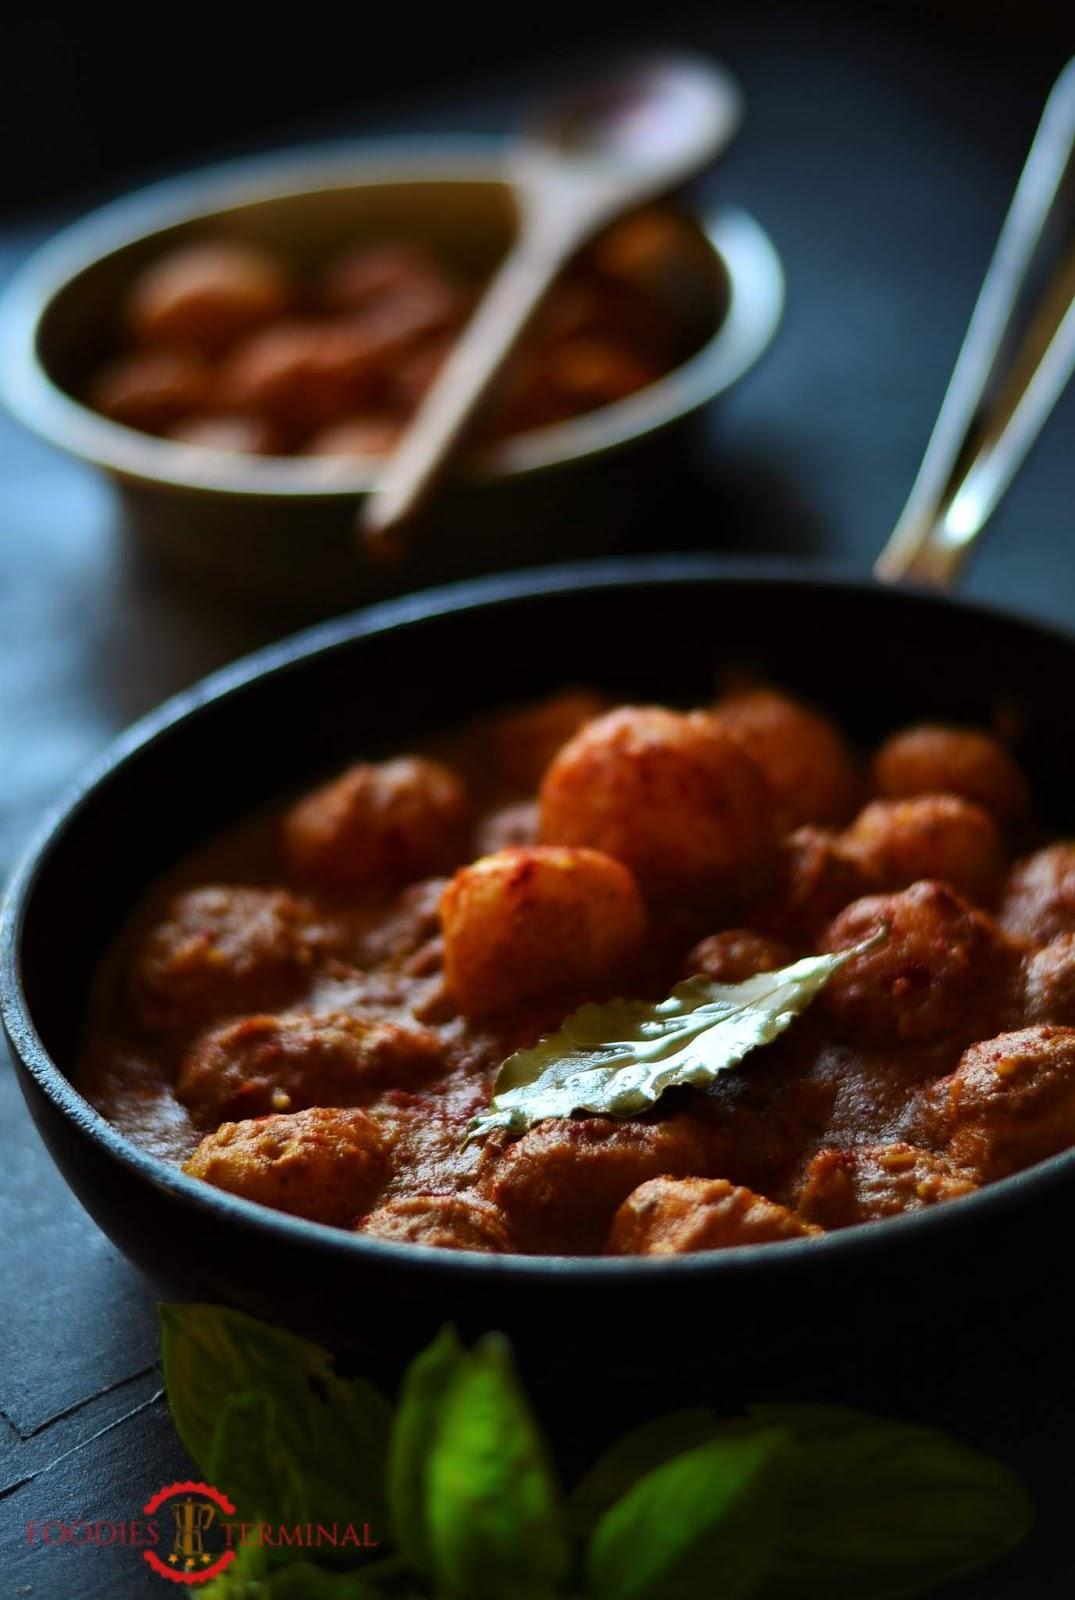 Niremishi Aloor dom, niremishi alur dom, bengali aloor dom, Alu Dum recipe, Dum alu recipe, Indian Alu dum recipe, badami aloo dum recipe, no onion no garlic recipe, fasting recipe, no onion no garlic alu recipe, alu sabzi recipe, aloo sabzi recipe, baby potatoes recipe, vegan baby potatoes recipe, vegan recipes, bengali recipes, bengali vegetarian recipe, indian begetarian recipe, vegetarian recipe, festival recipe, navratri recipe, navratri fasting recipe